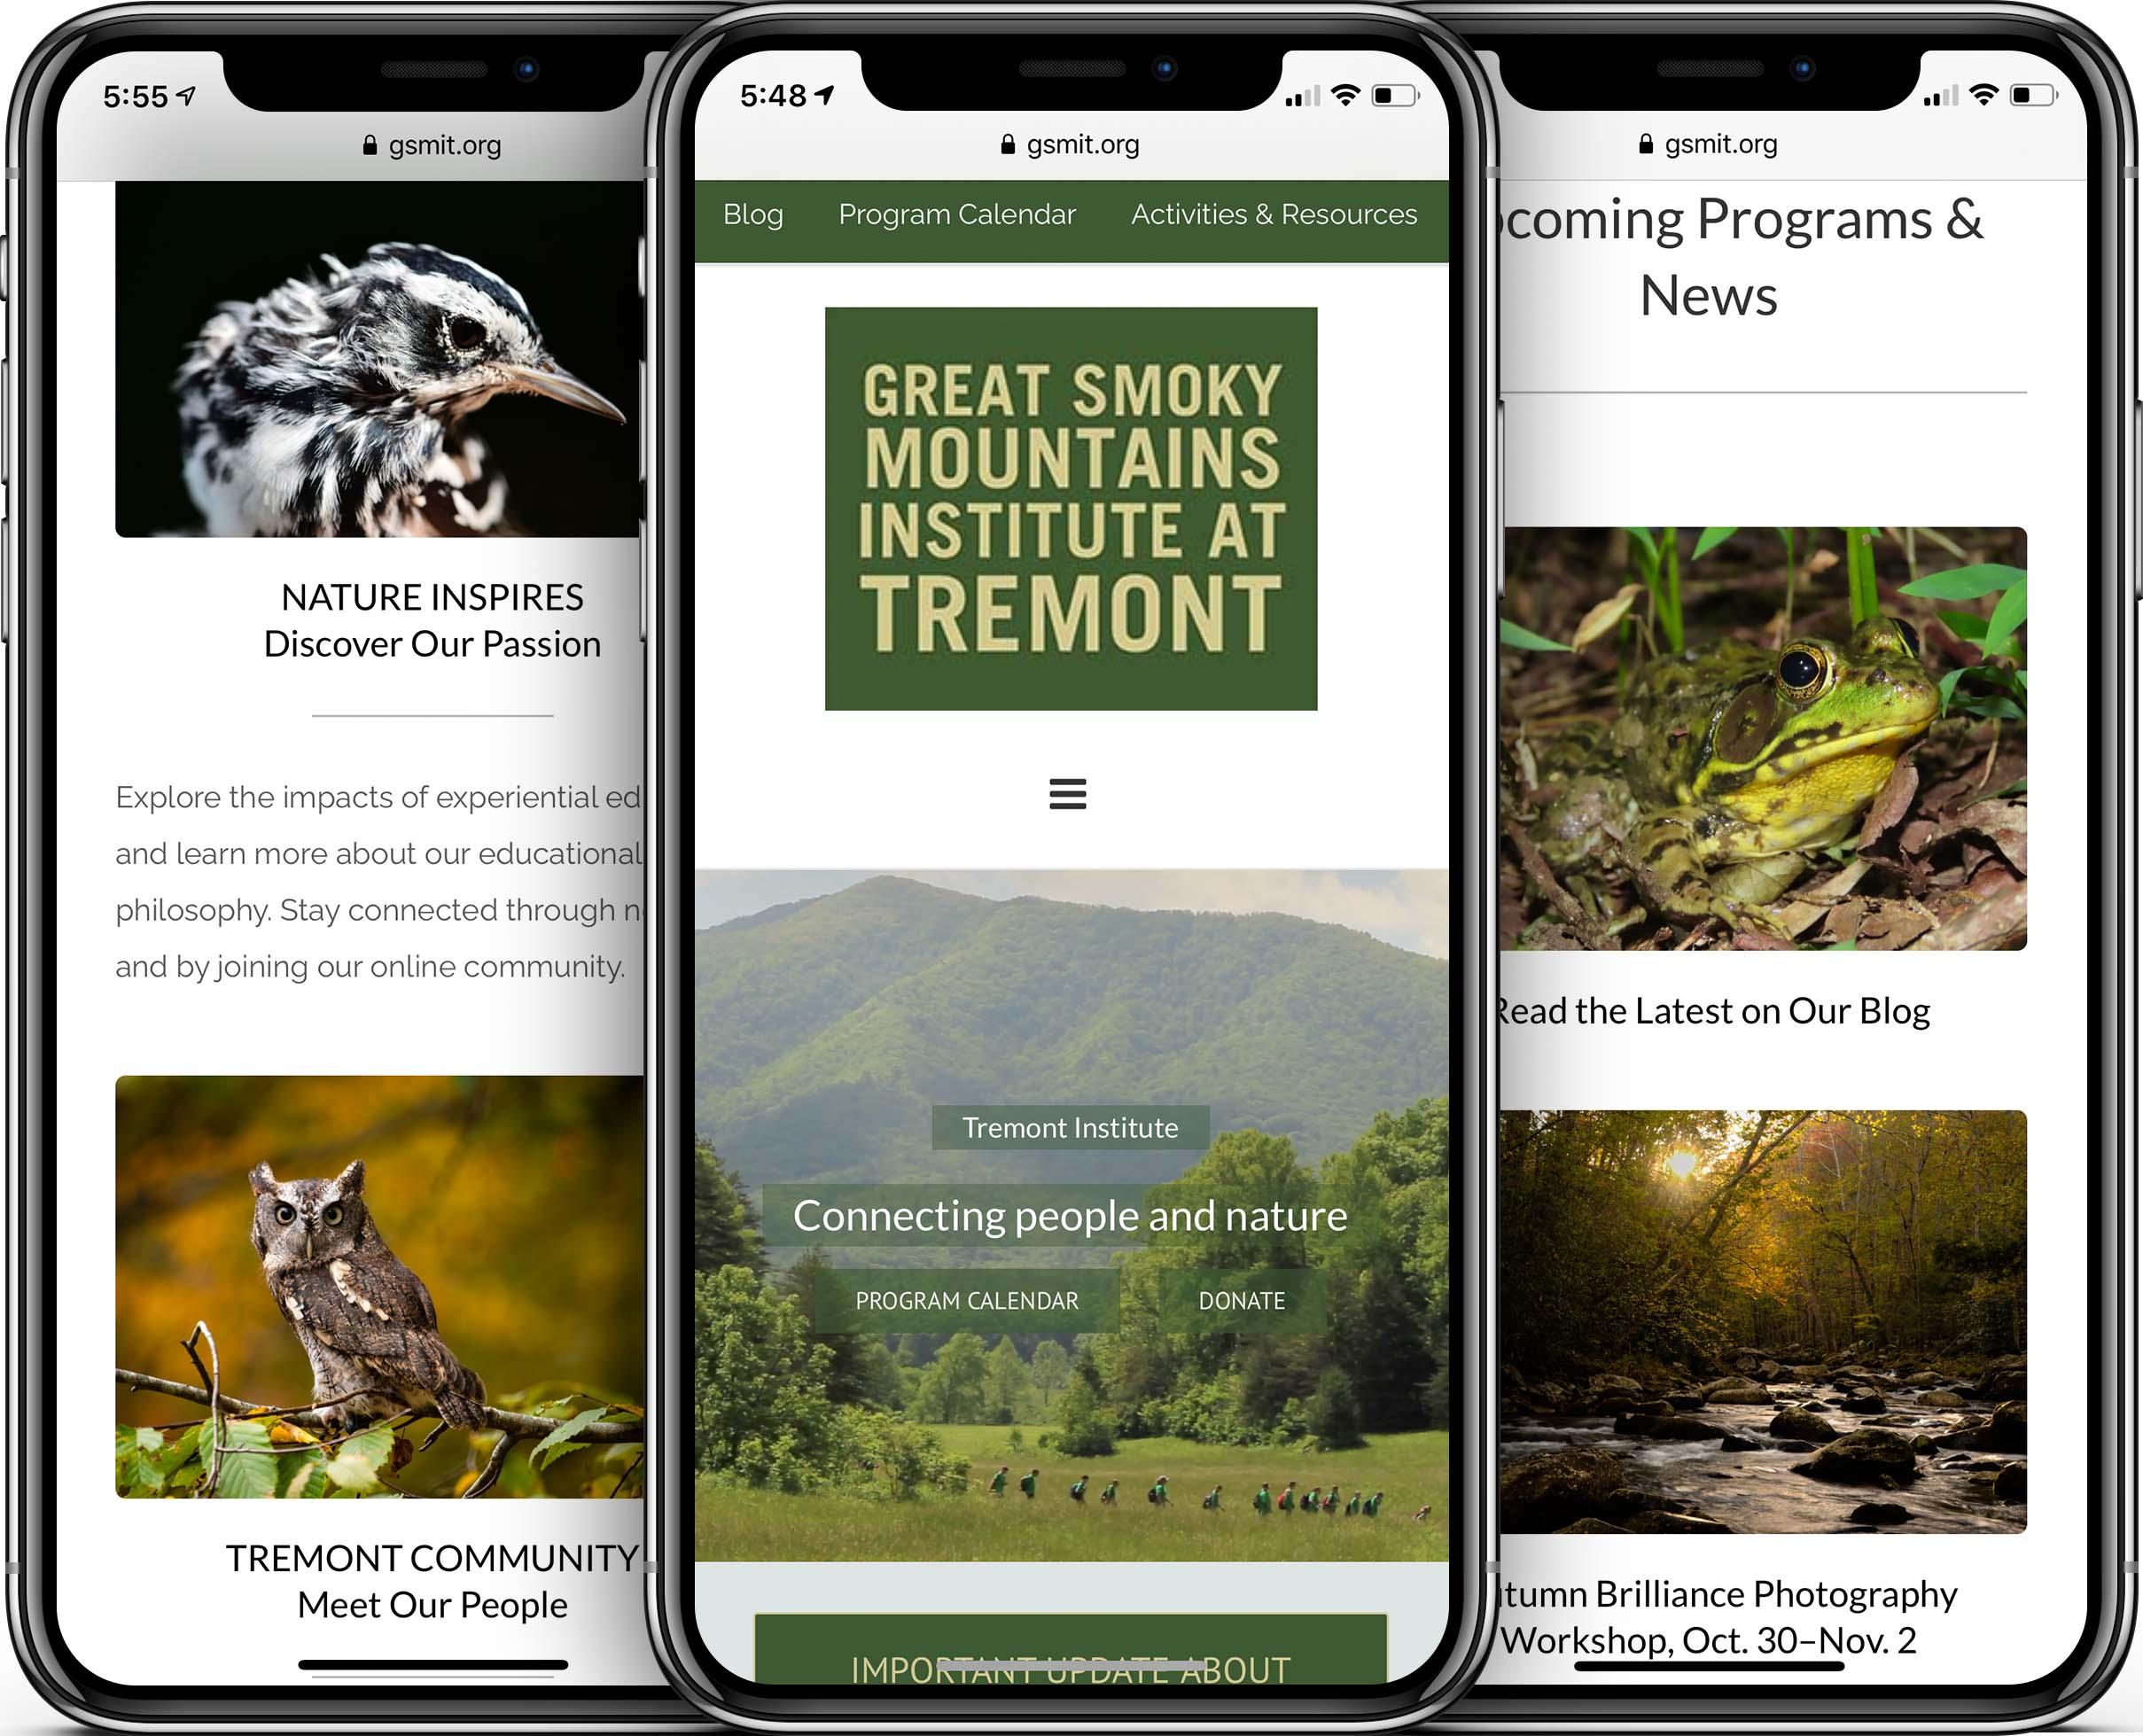 GSMIT Mobile-Friendly Web Design